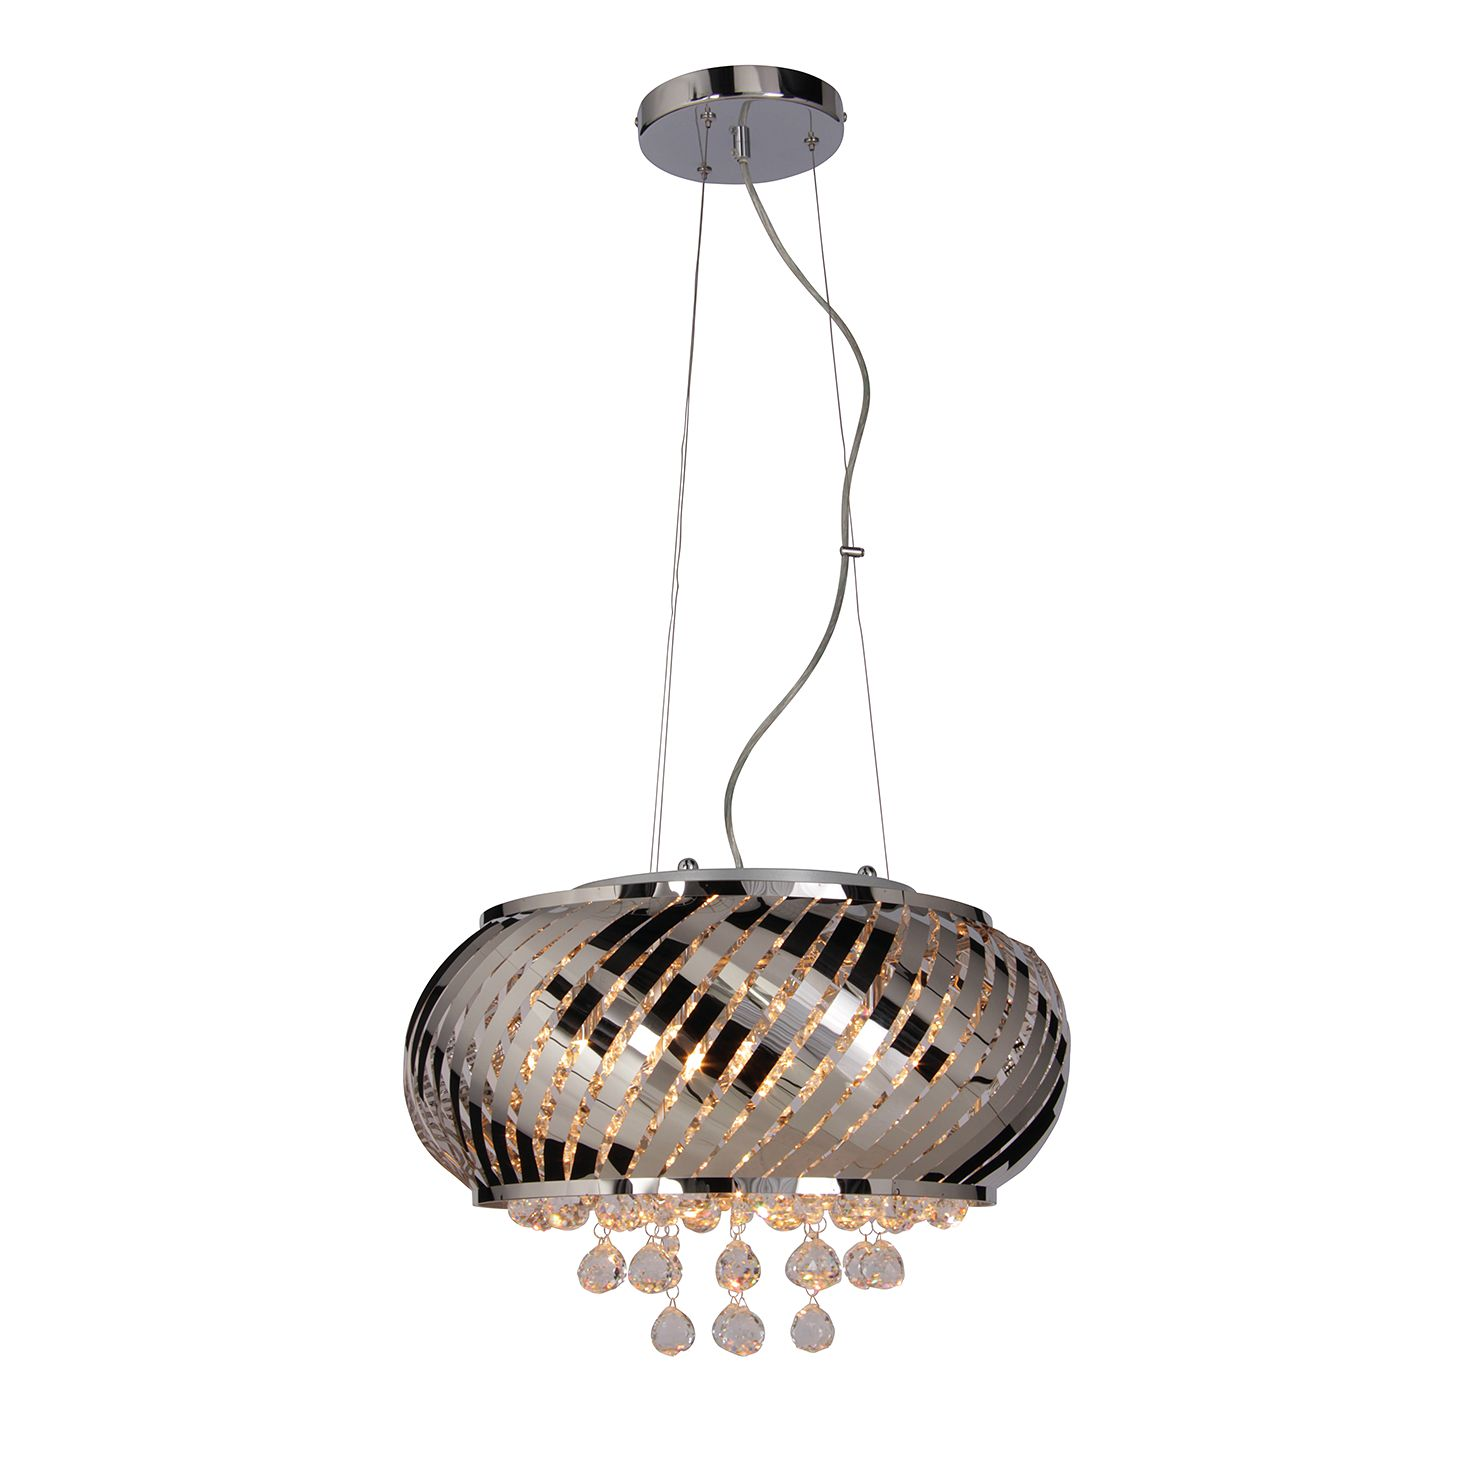 energie  A++, Hanglamp Crystallo by Näve - staal/zilverkleurig glas 6 lichtbronnen, Näve